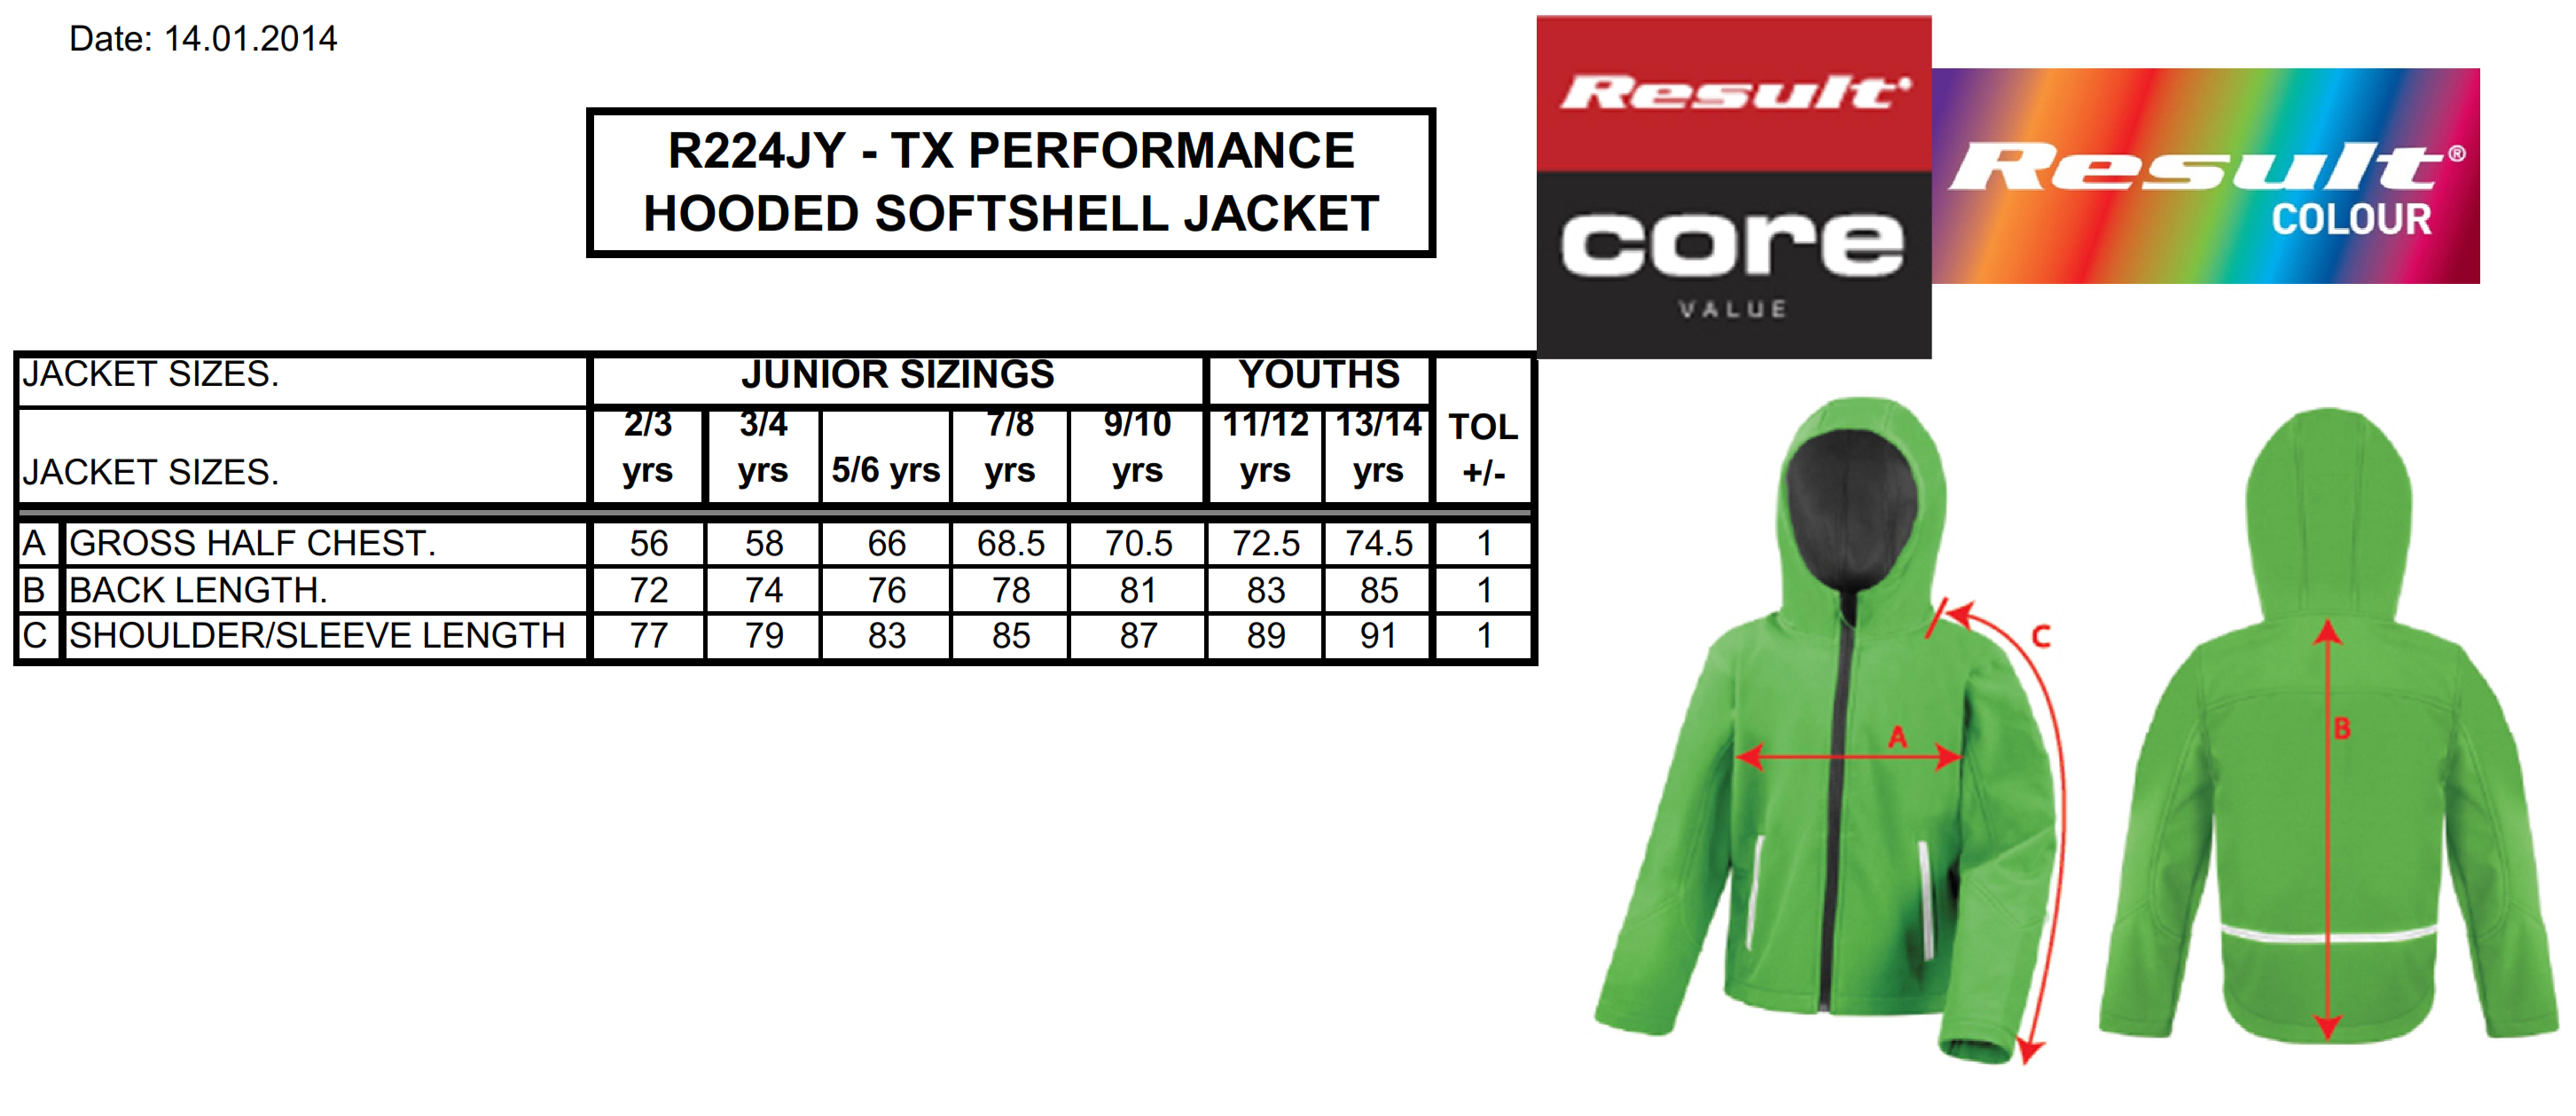 Result: Kids TX Performance Hooded Softshell Jacket R224J/Y